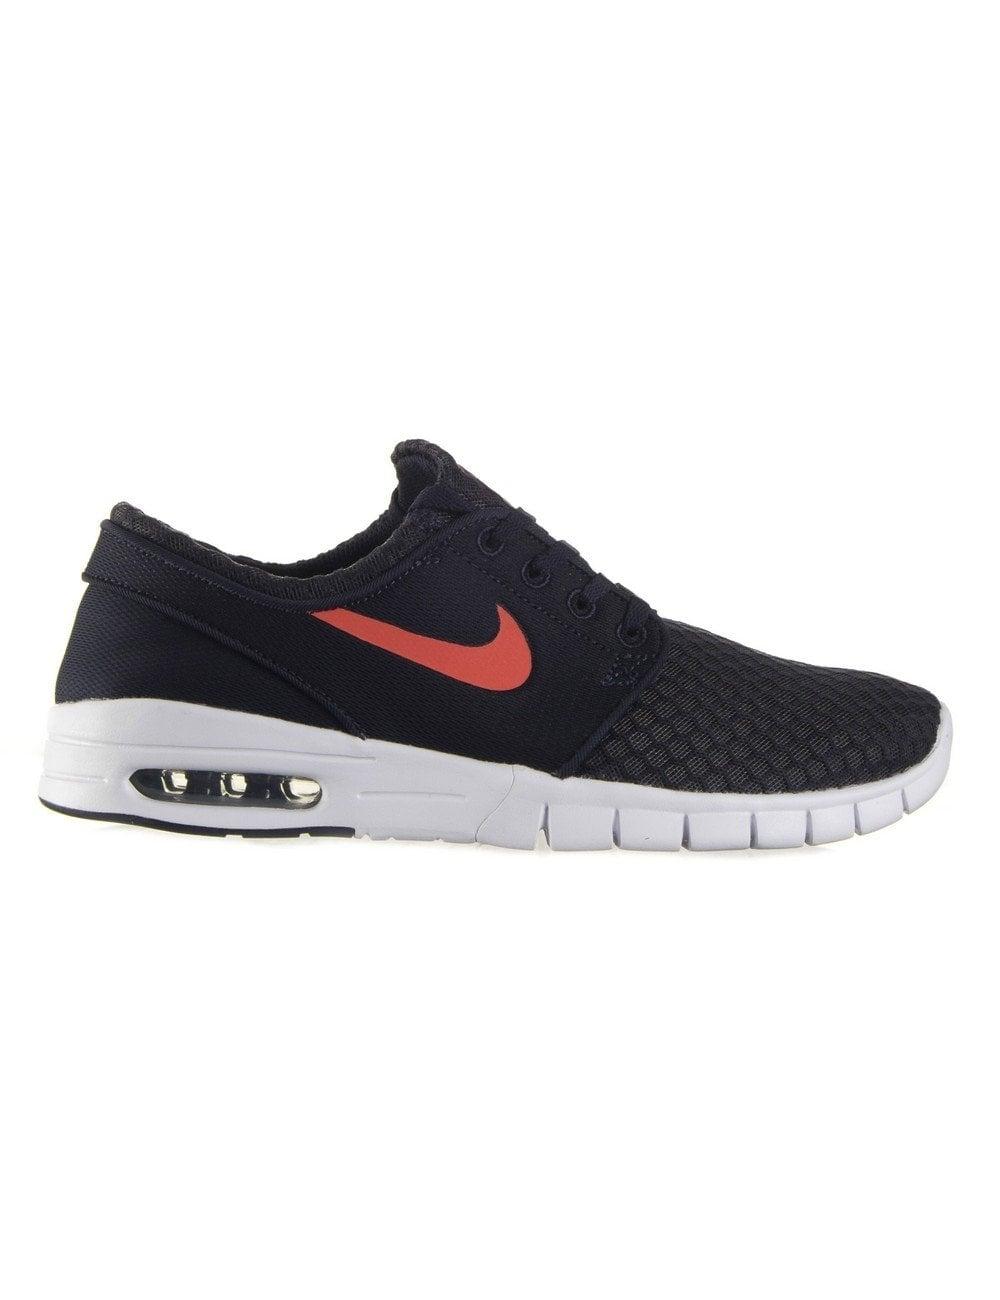 43ab6c415764 Nike SB Stefan Janoski Max Shoes - Obsidian Hot Lava - Footwear from ...